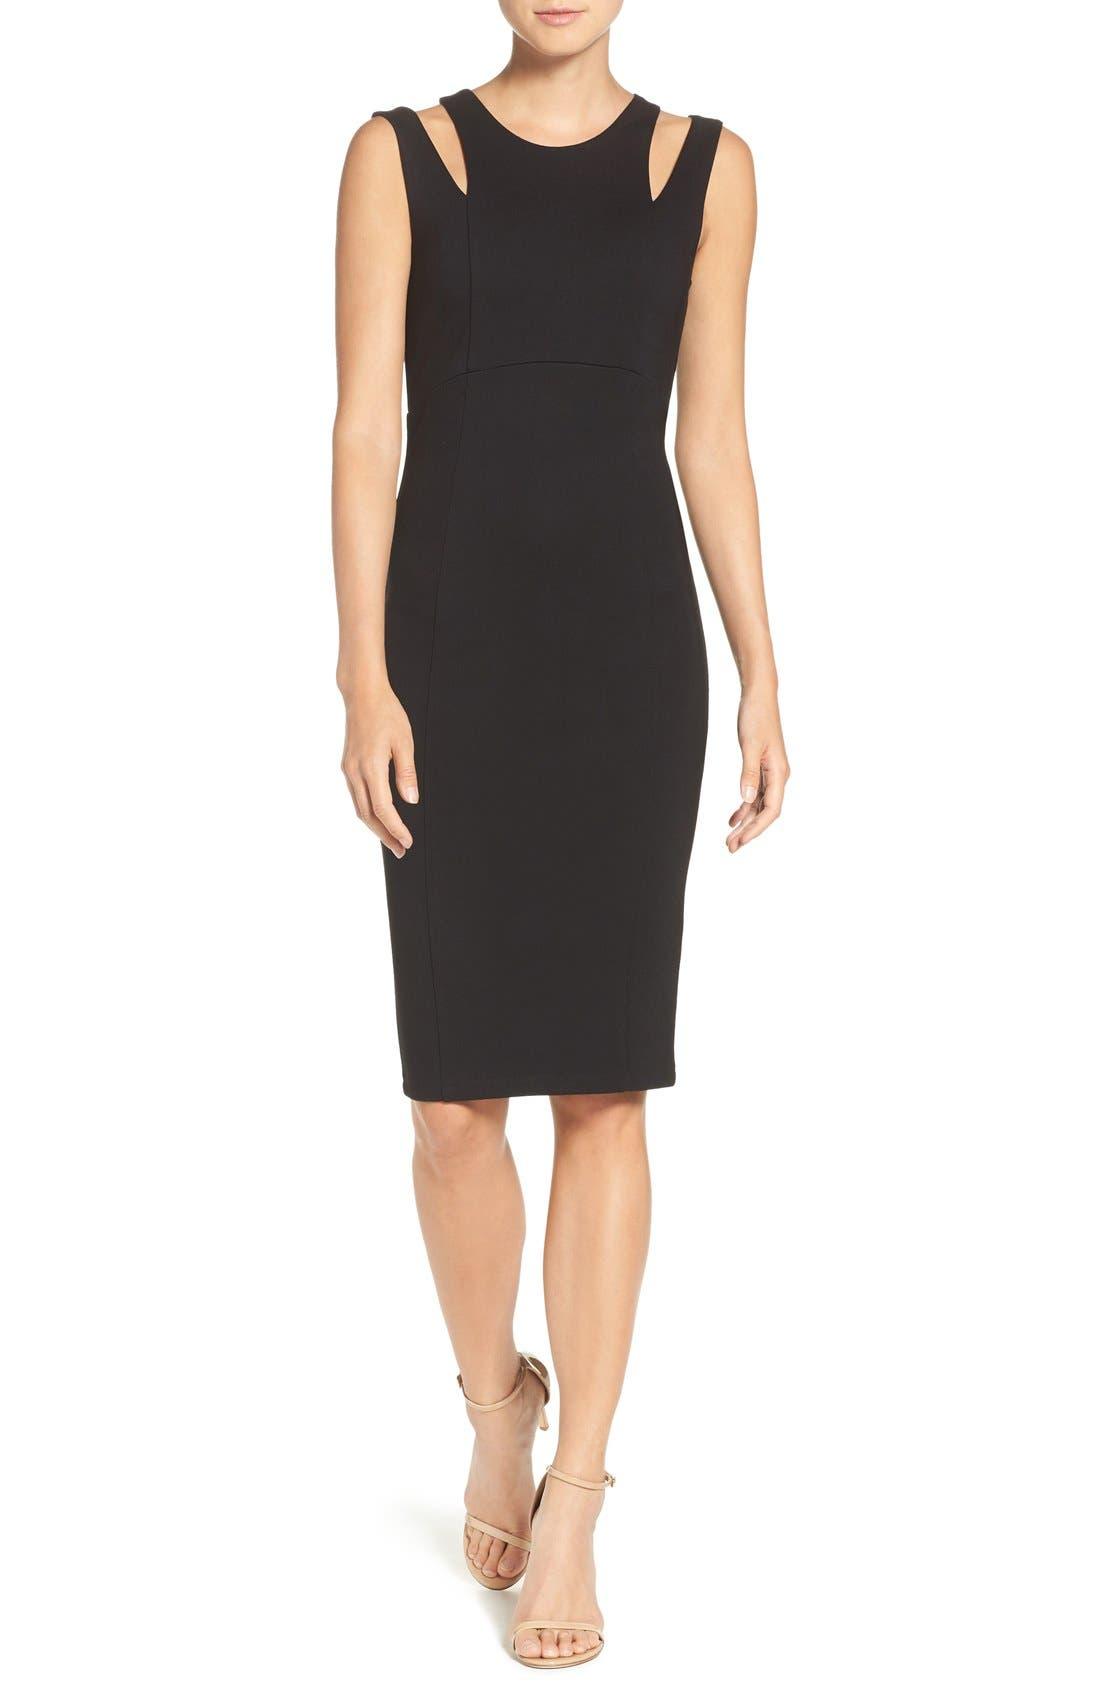 Main Image - Felicity & Coco Shoulder Detail Ponte Sheath Dress (Regular & Petite) (Nordstrom Exclusive)